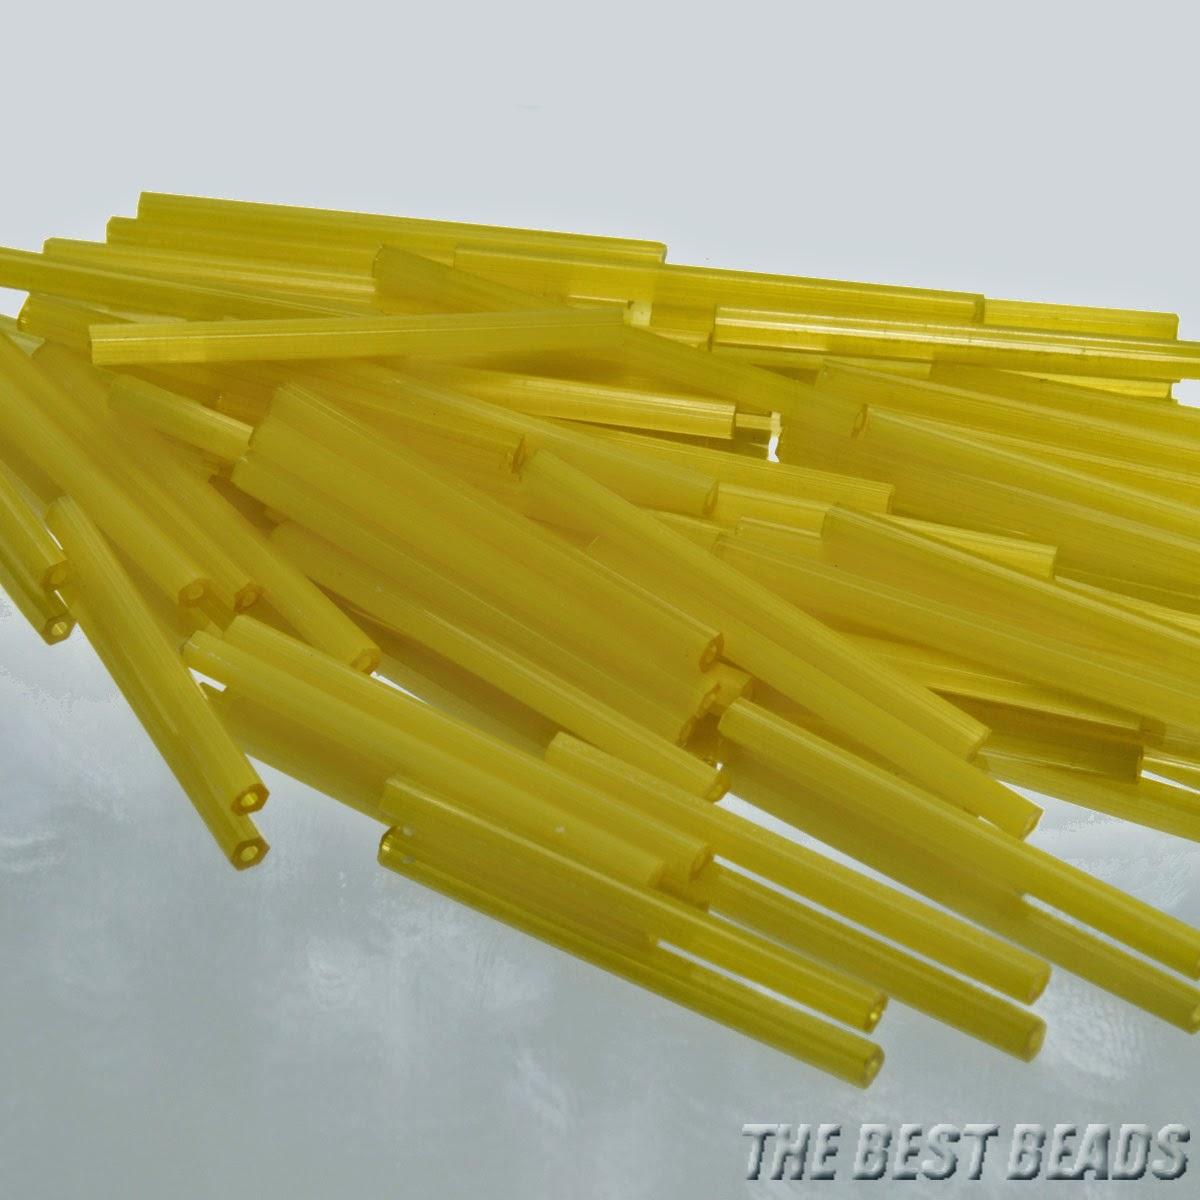 https://www.etsy.com/listing/198955931/15g-70pcs-silky-yellow-bugle-beads-30mm